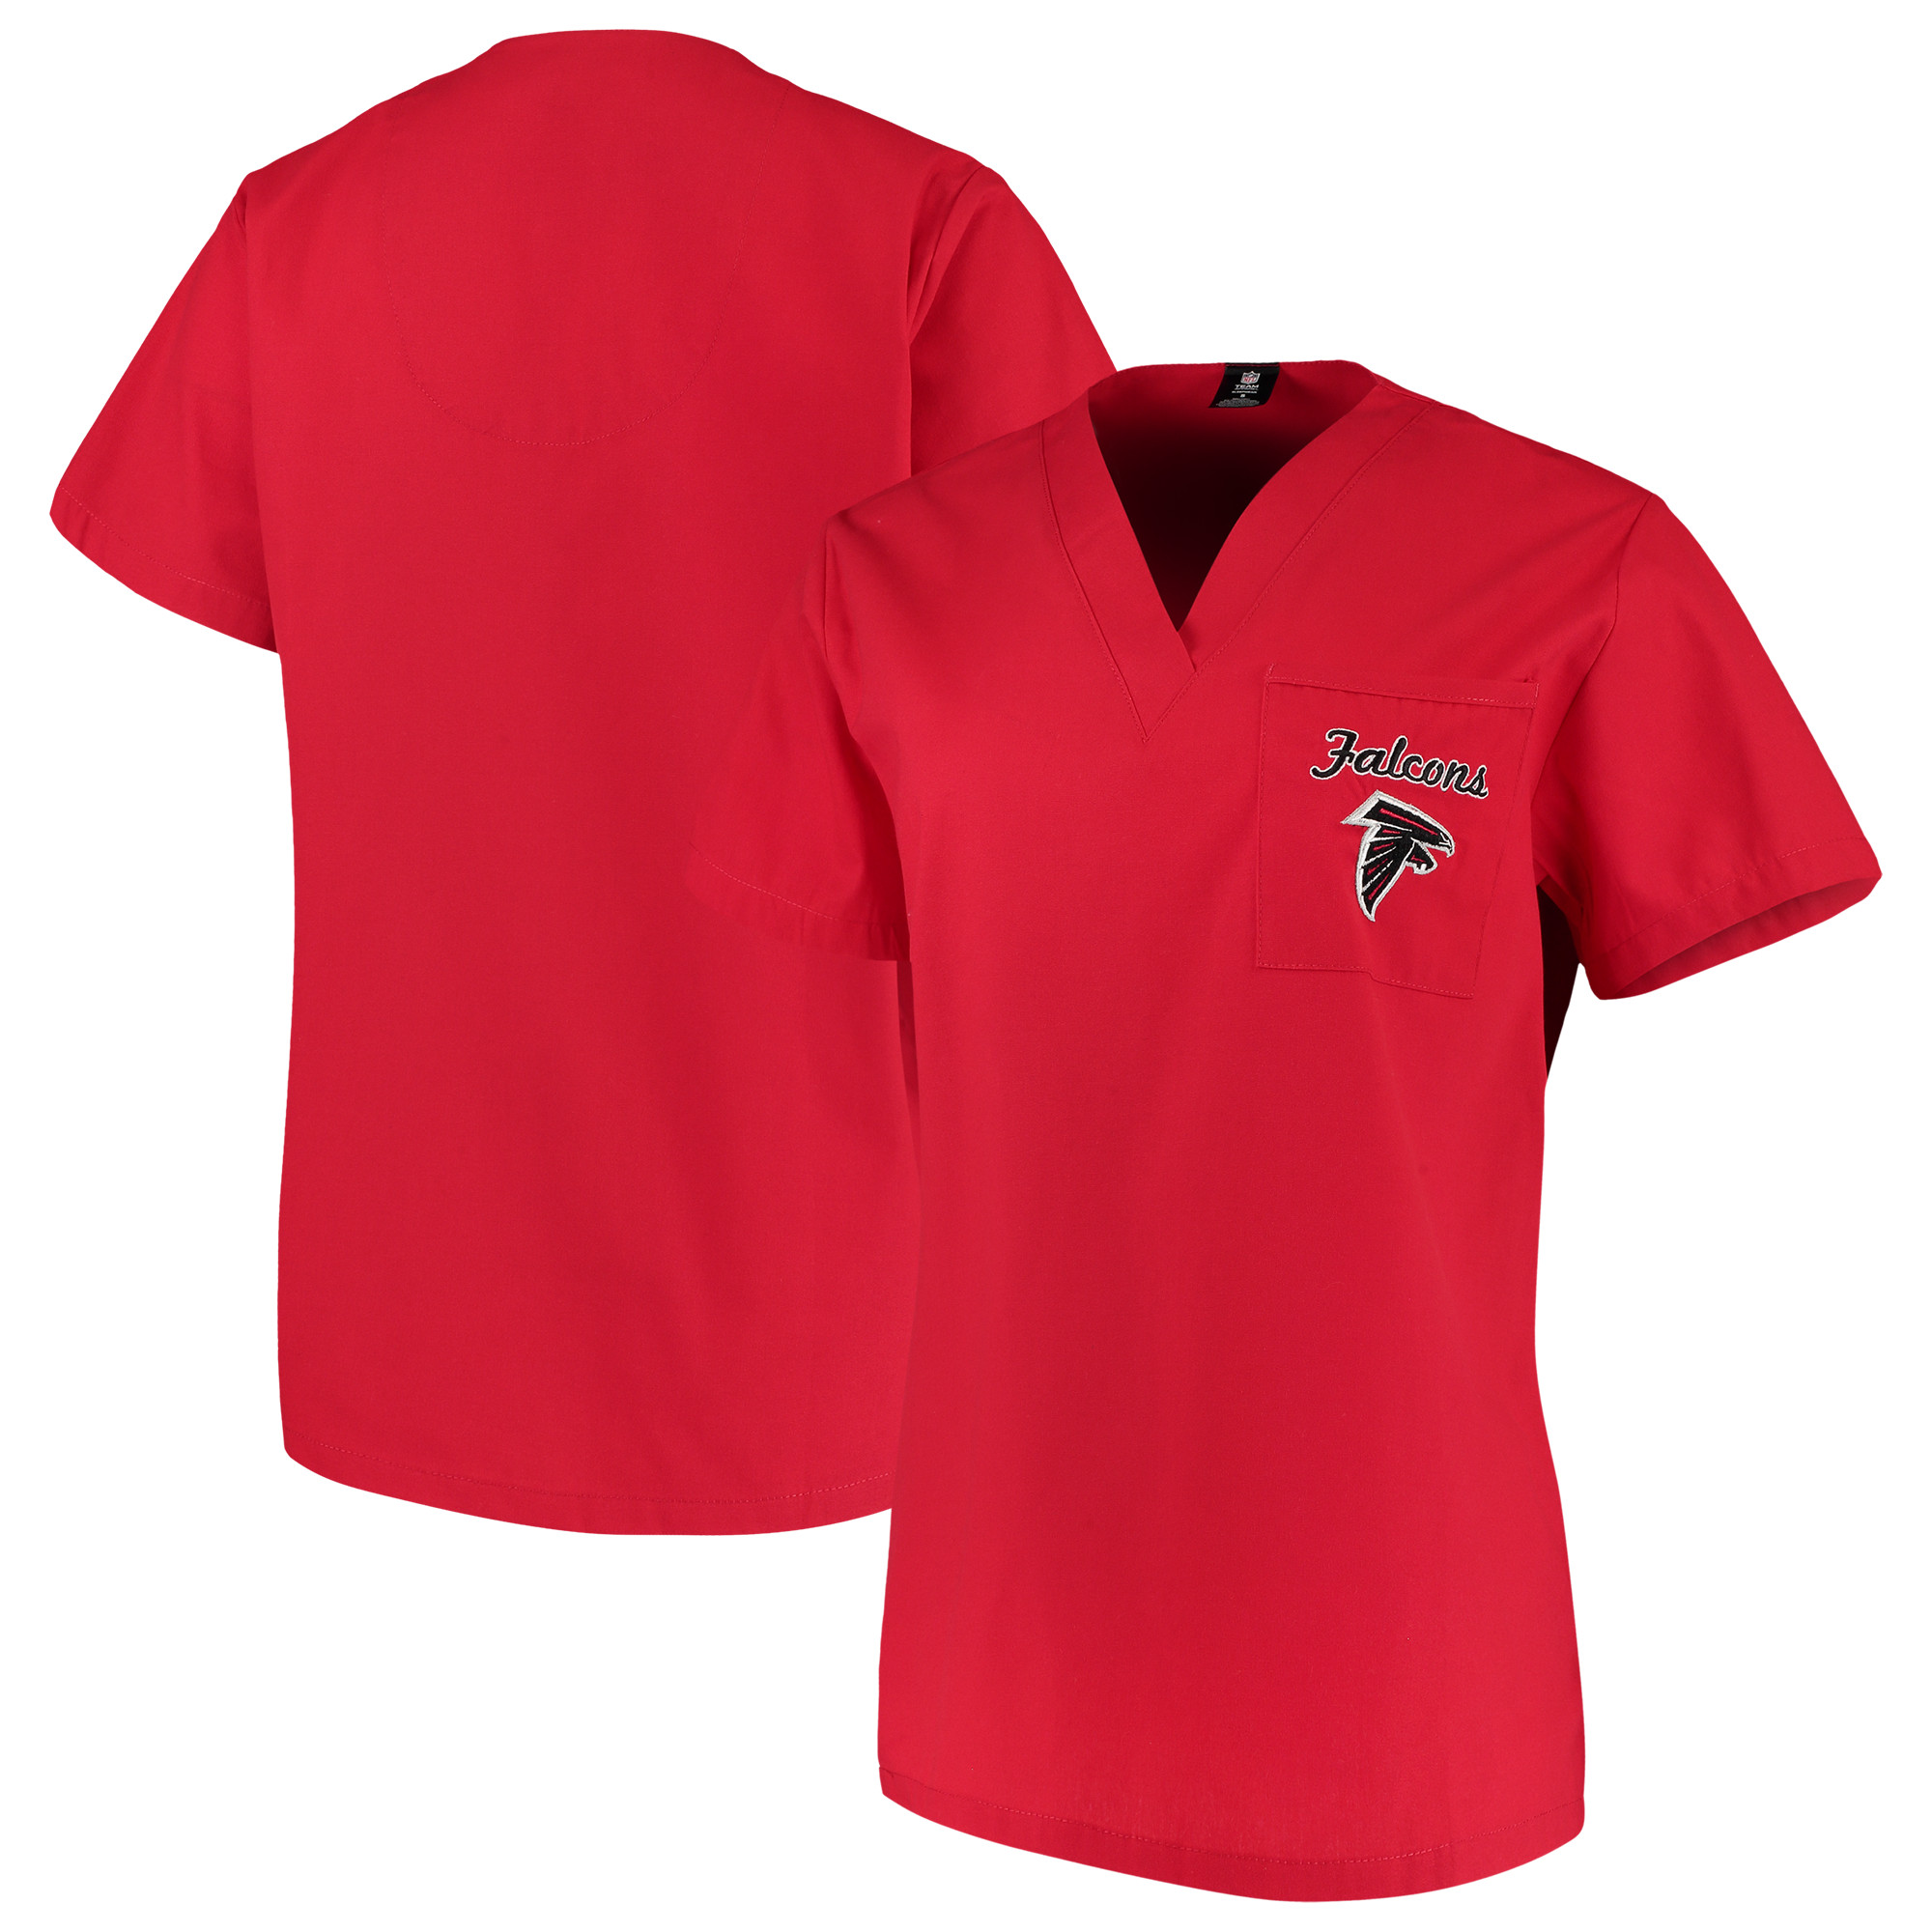 Atlanta Falcons Concepts Sport Women's Scrub Top - Red